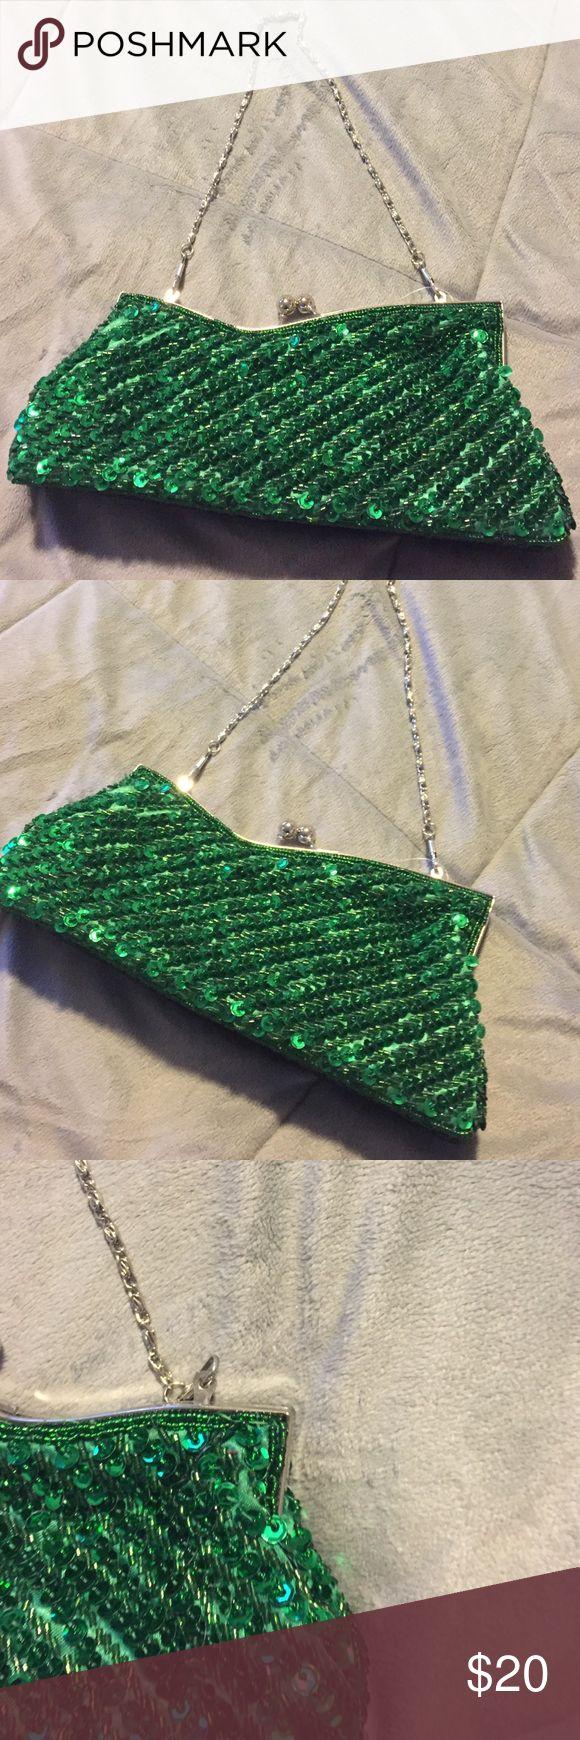 Green clutch Green clutch Bags Clutches & Wristlets